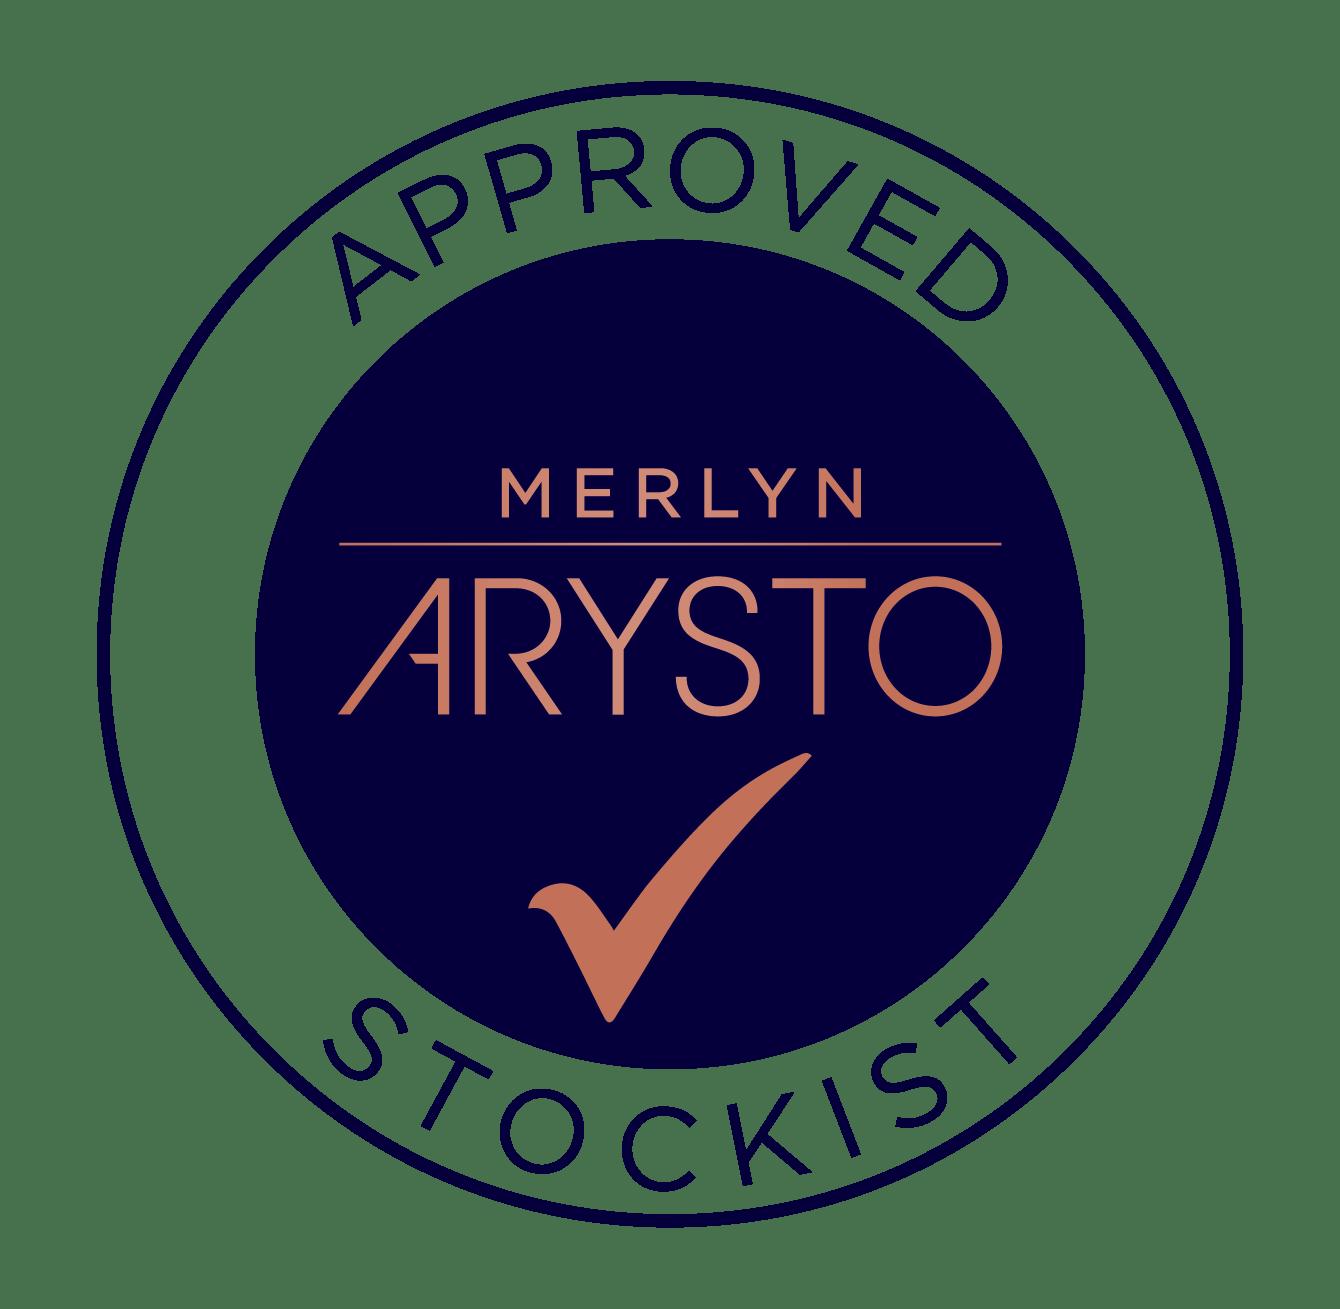 merlyn arysto